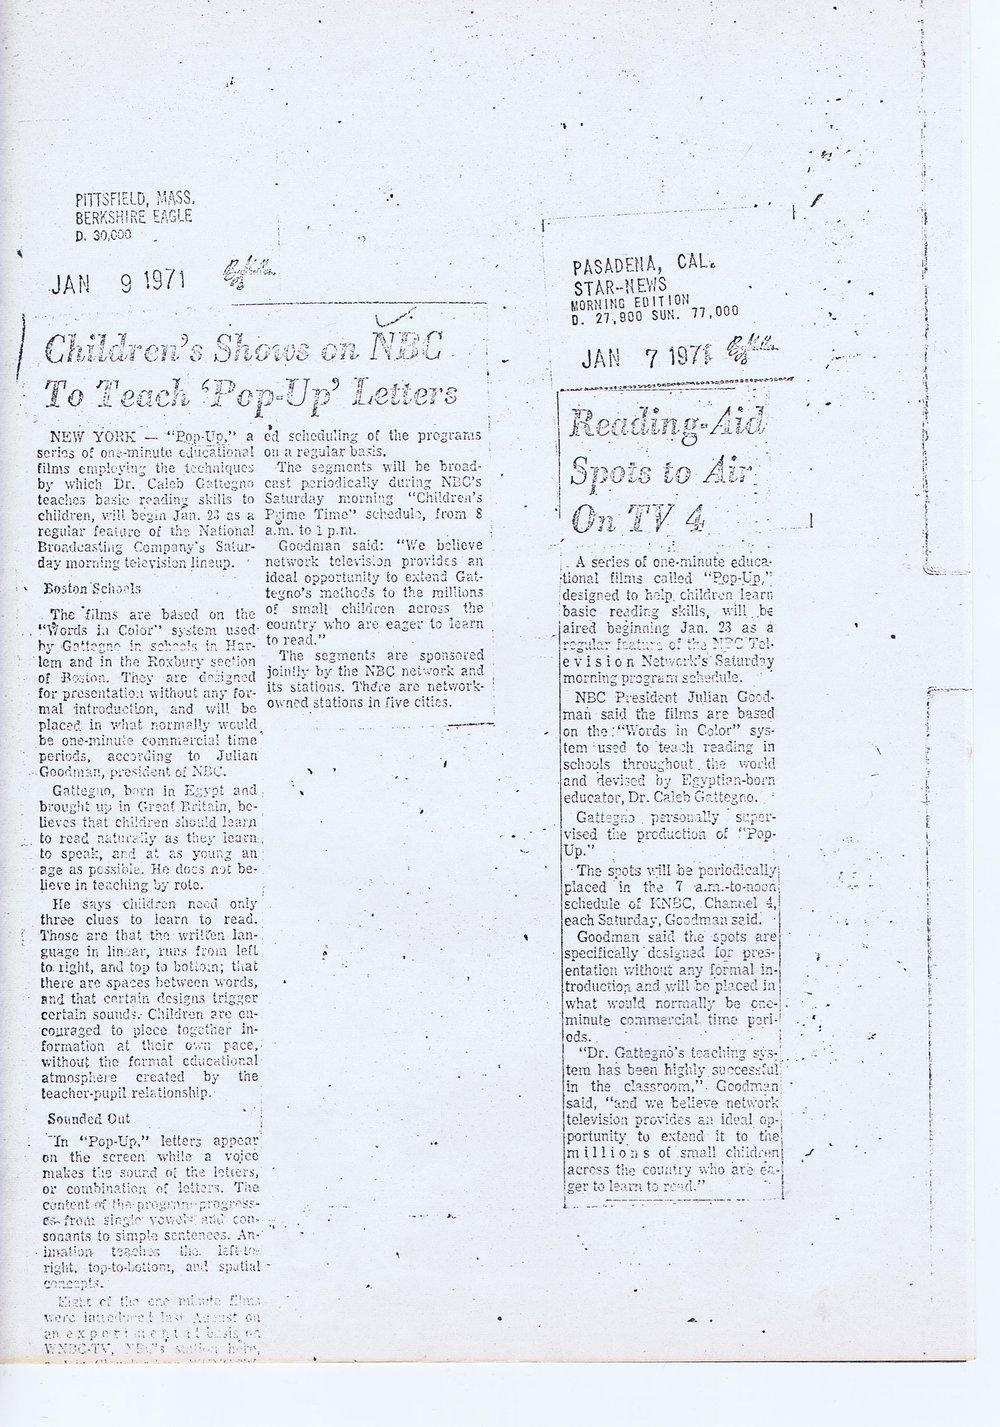 Berkshire Eagle, Star News, Jan 1971.jpg